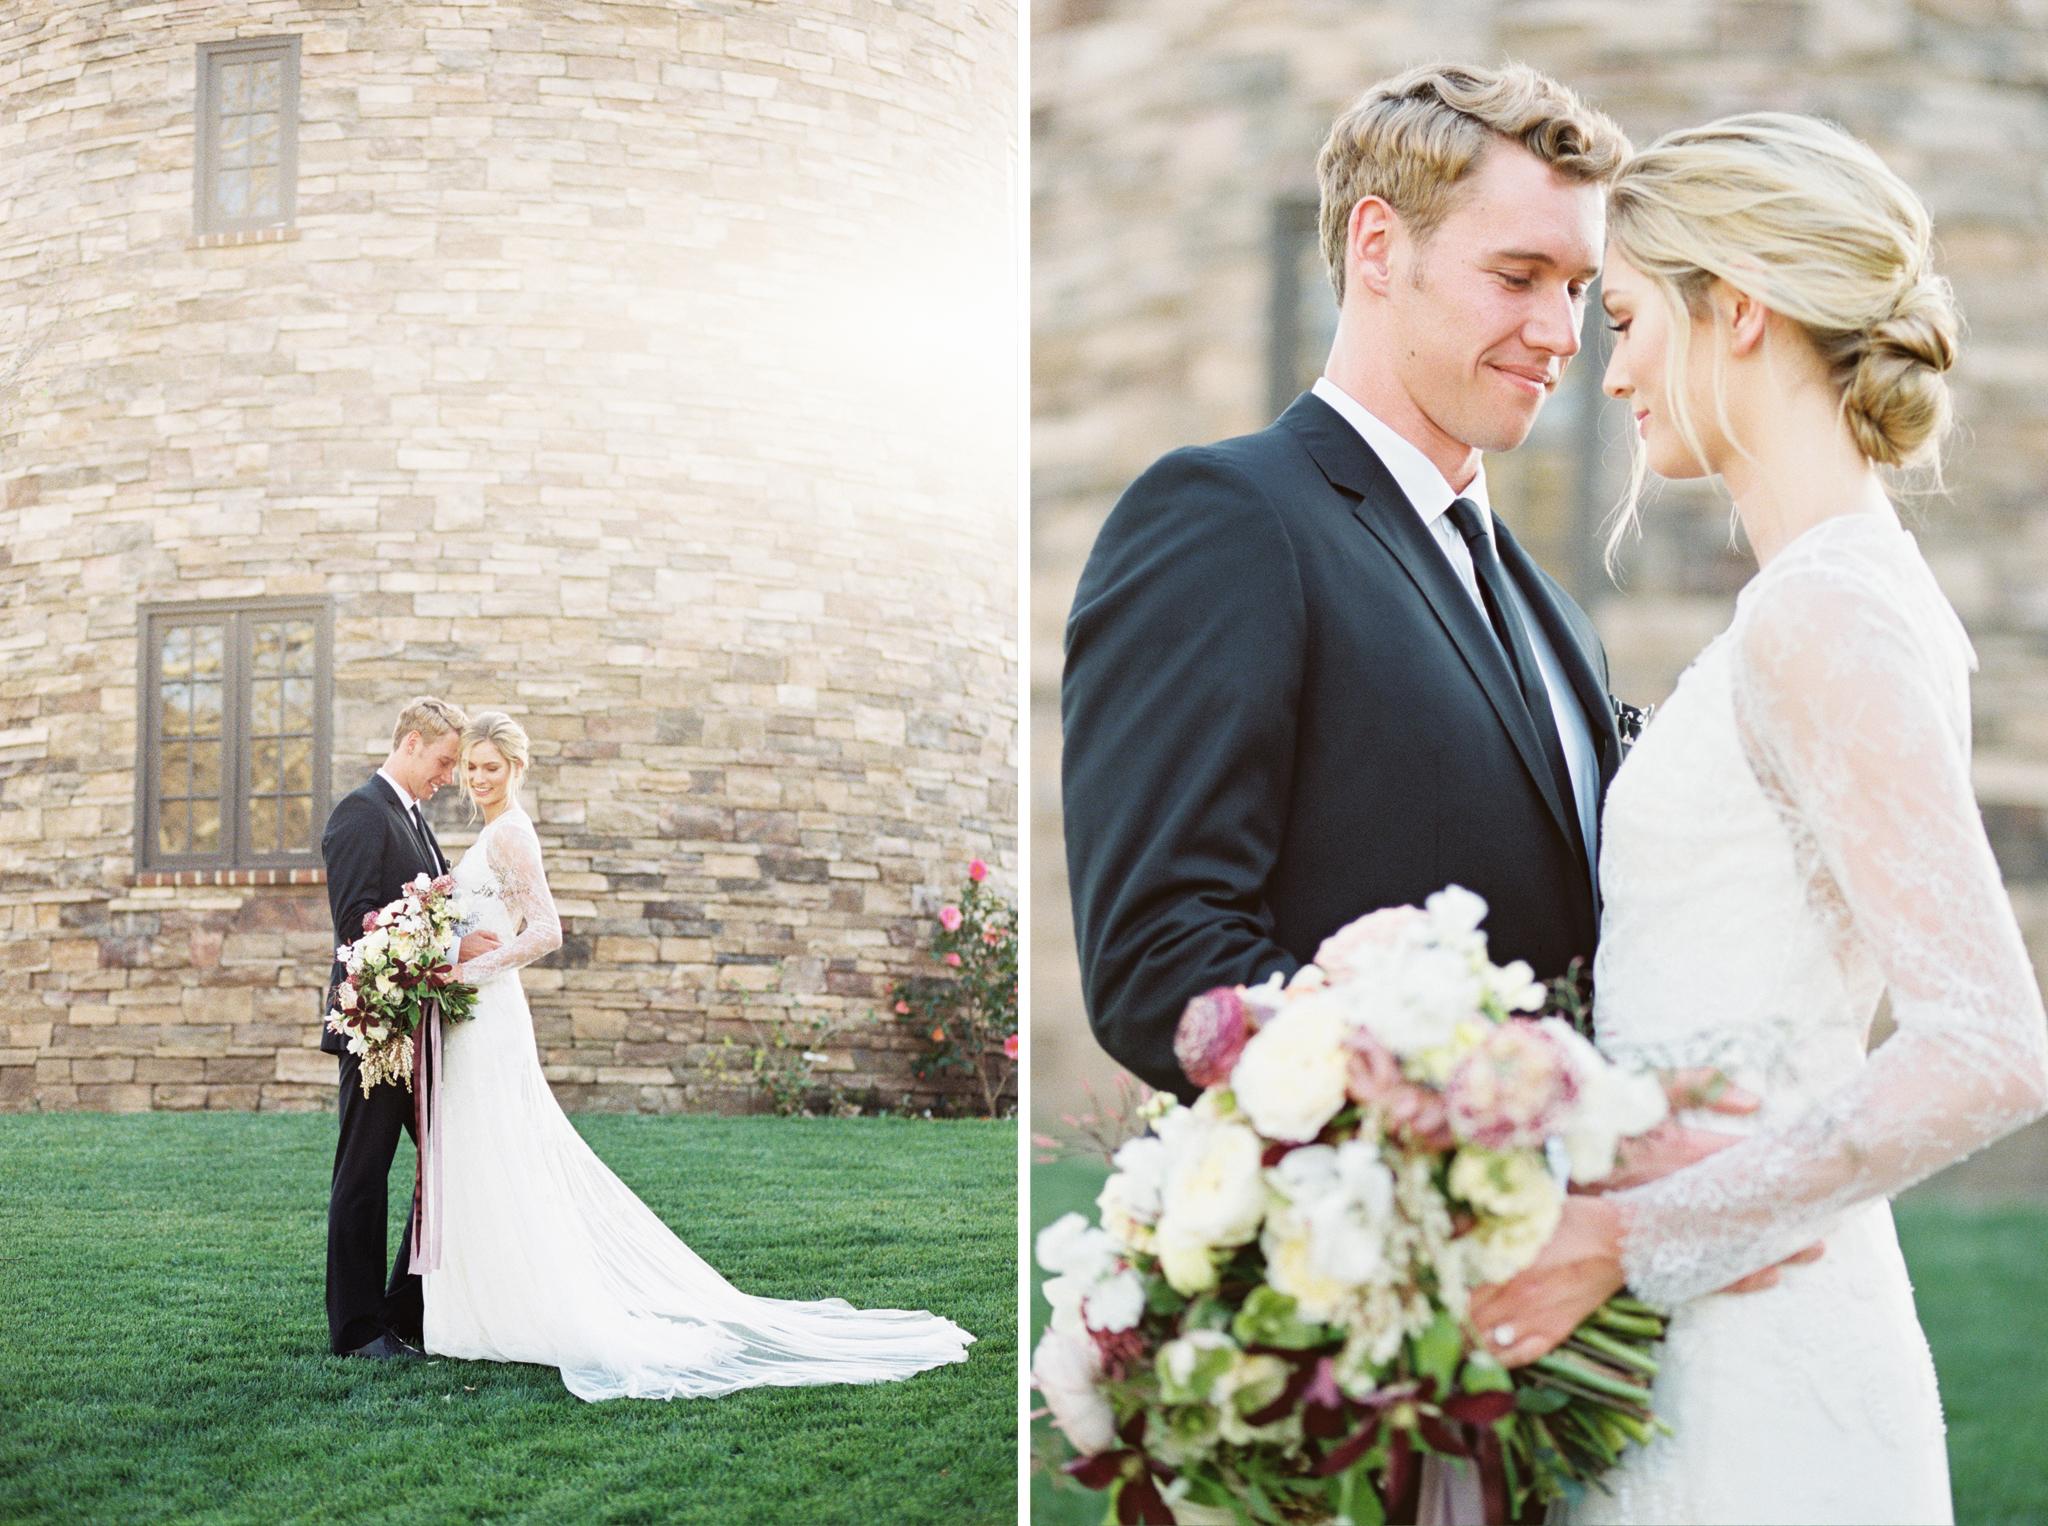 Kestrel Park Wedding Photographer